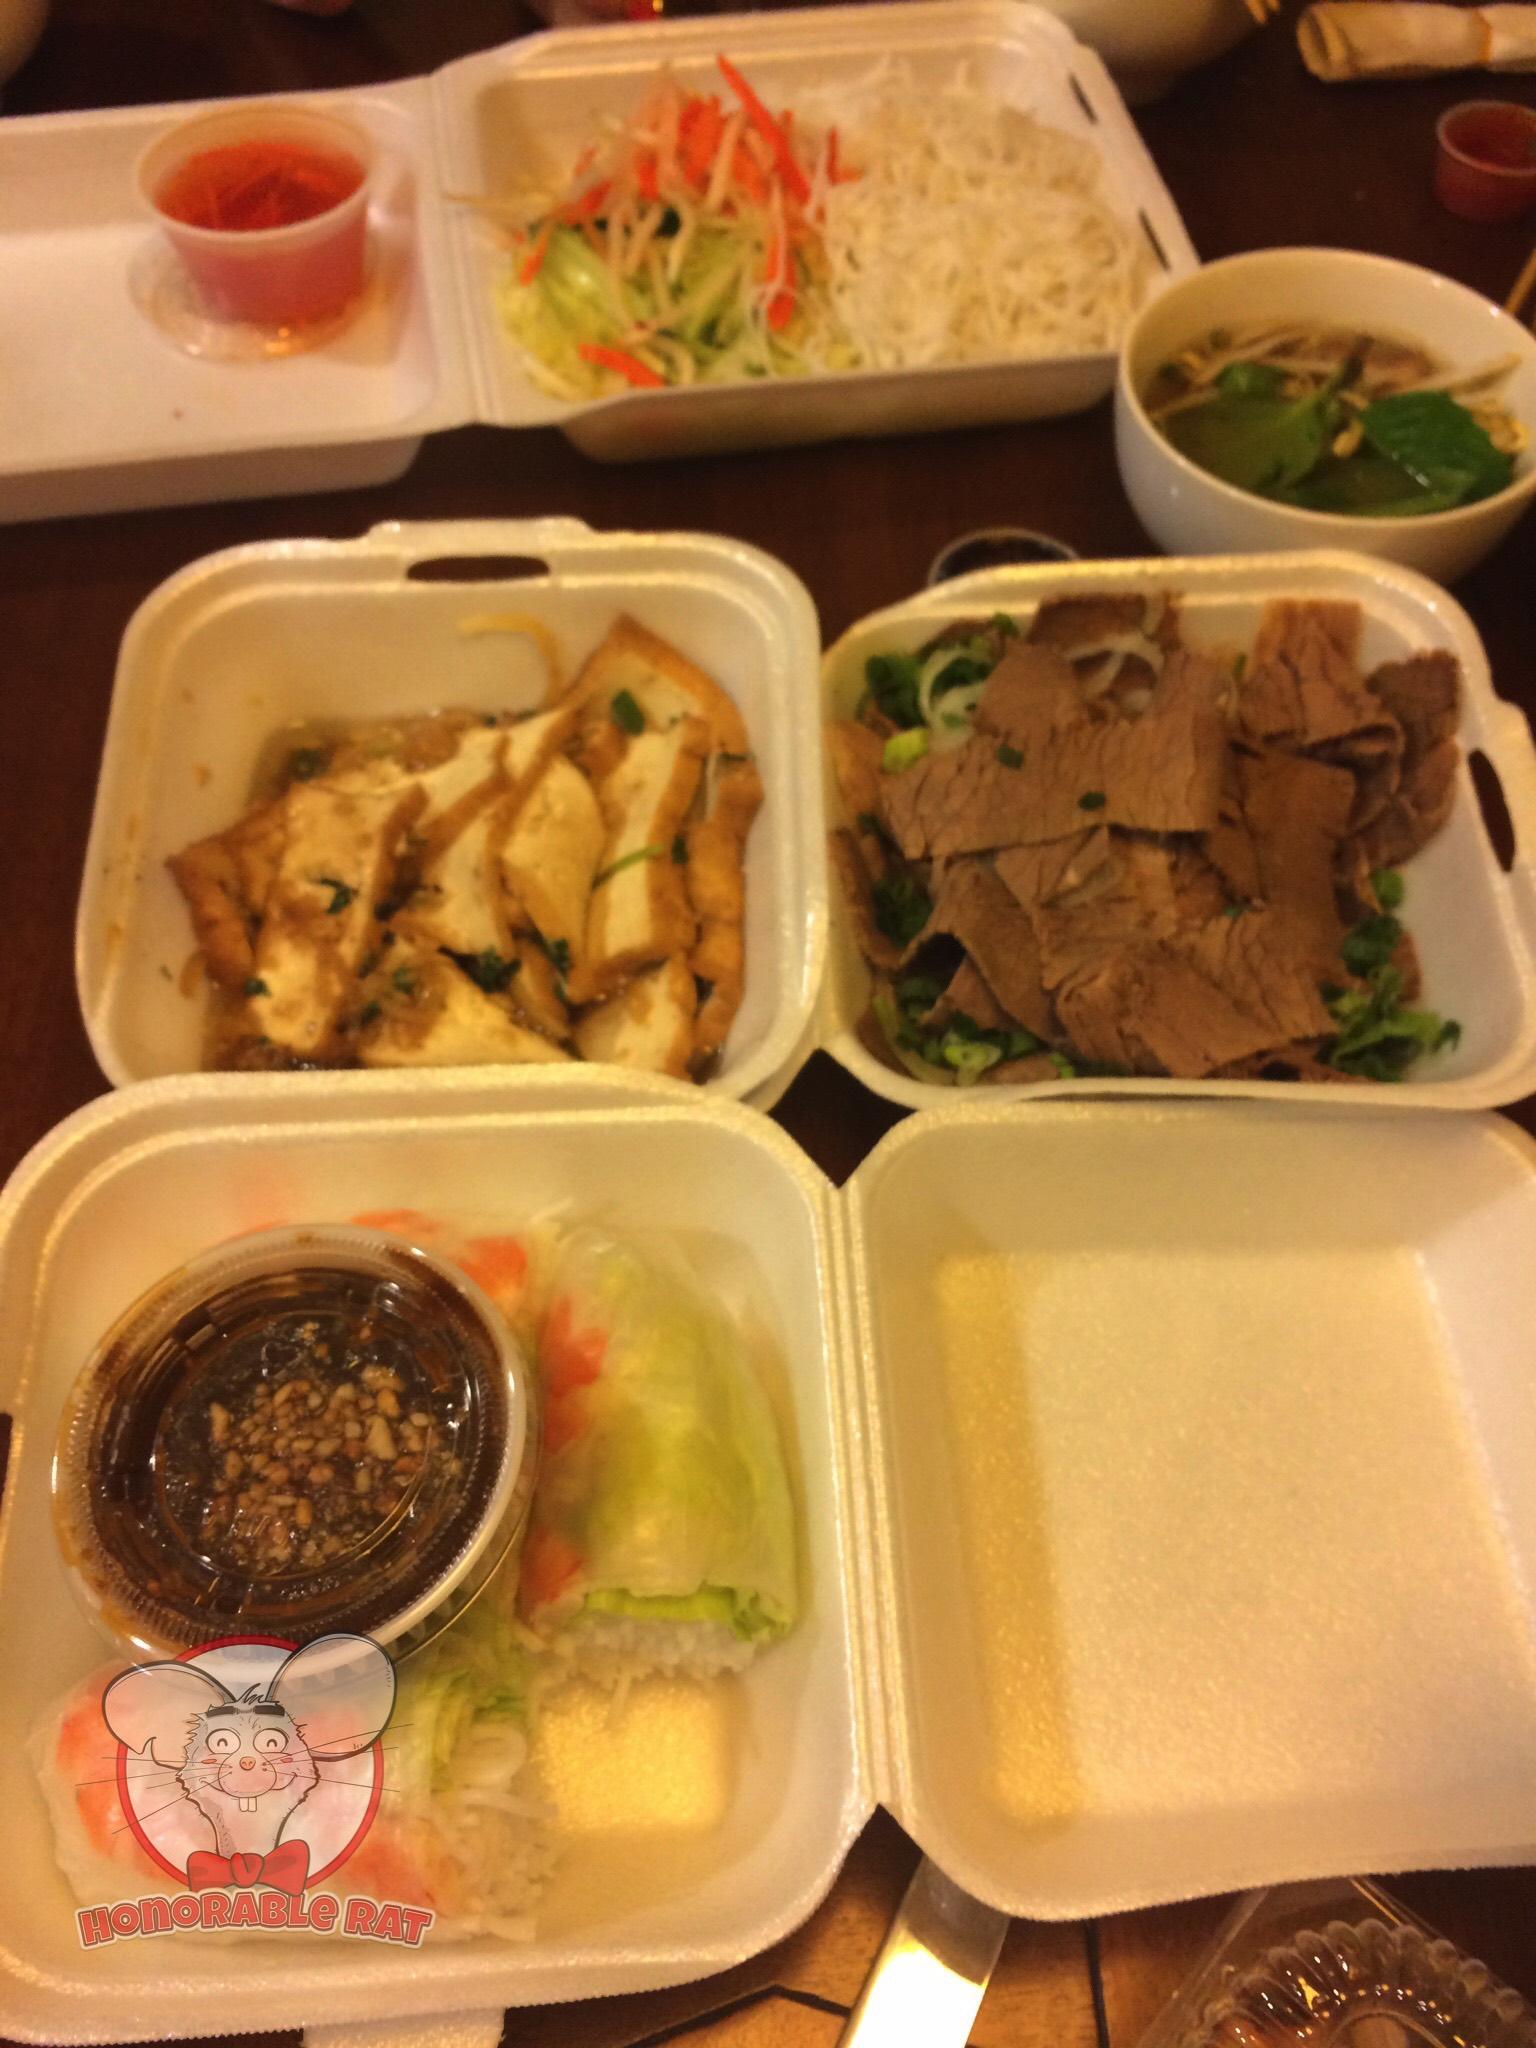 Summer Rolls, Tofu & Beef Brisket